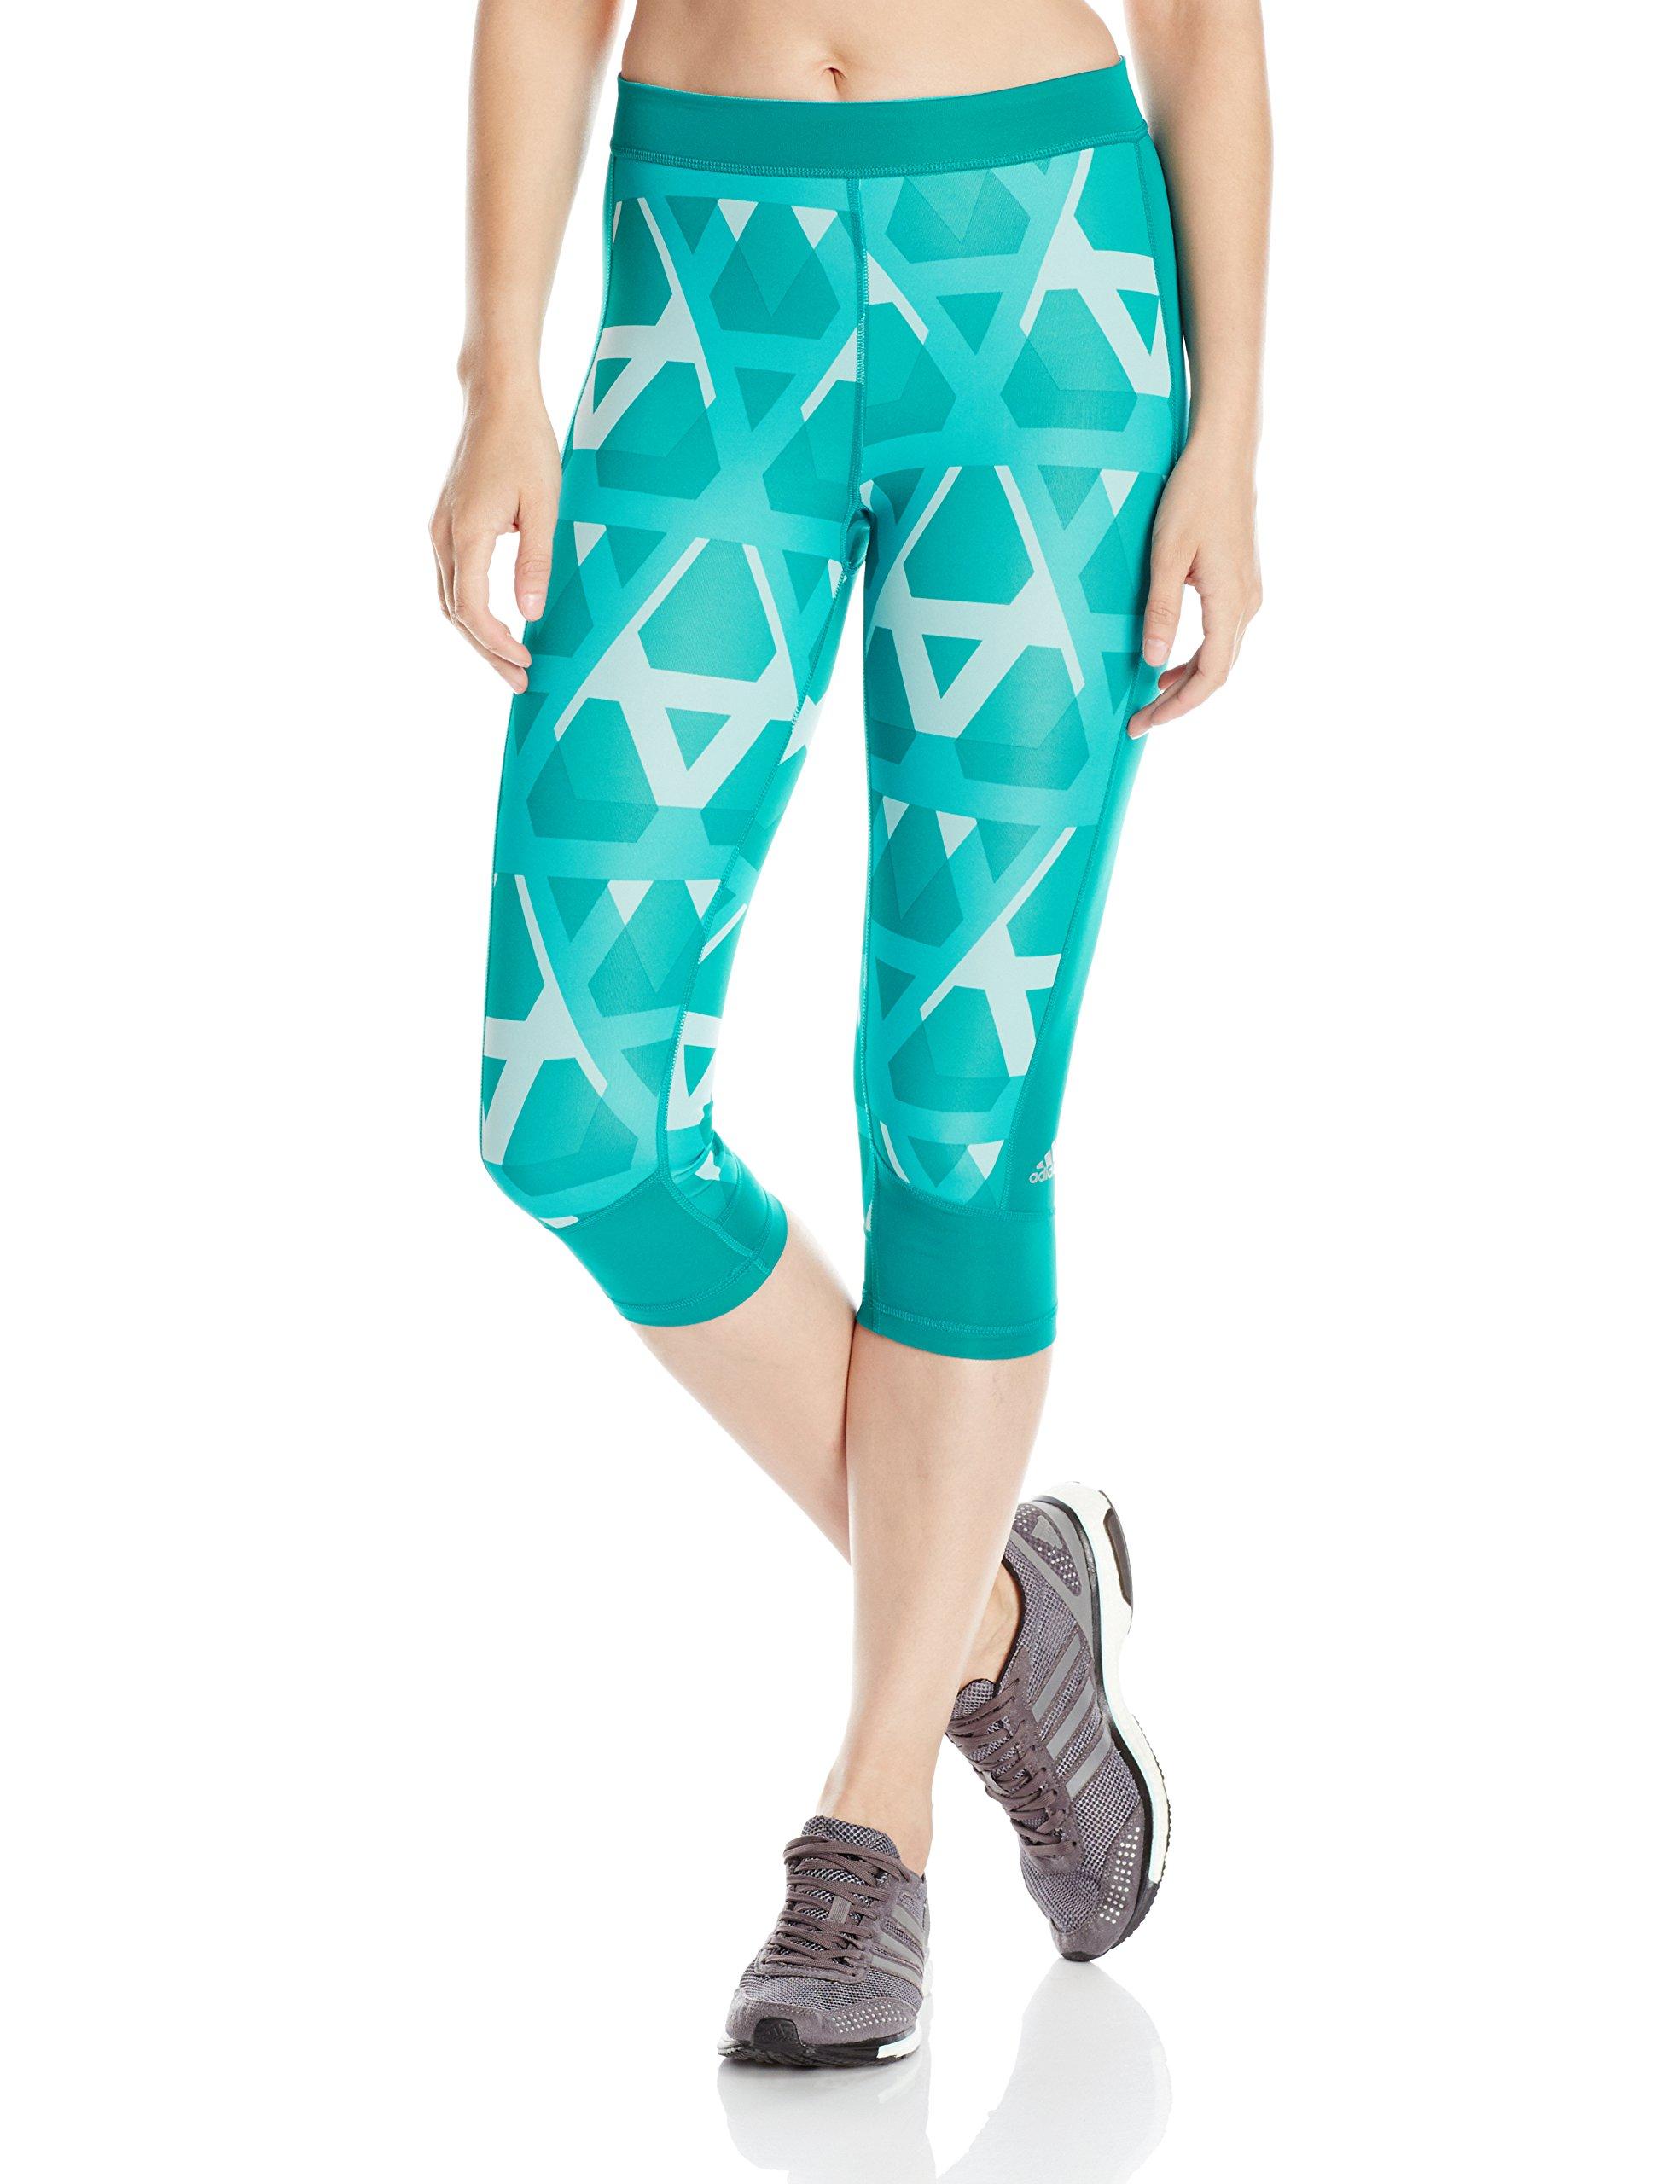 adidas Women's Techfit Capris, Equipment Green/Tri Print, X-Small